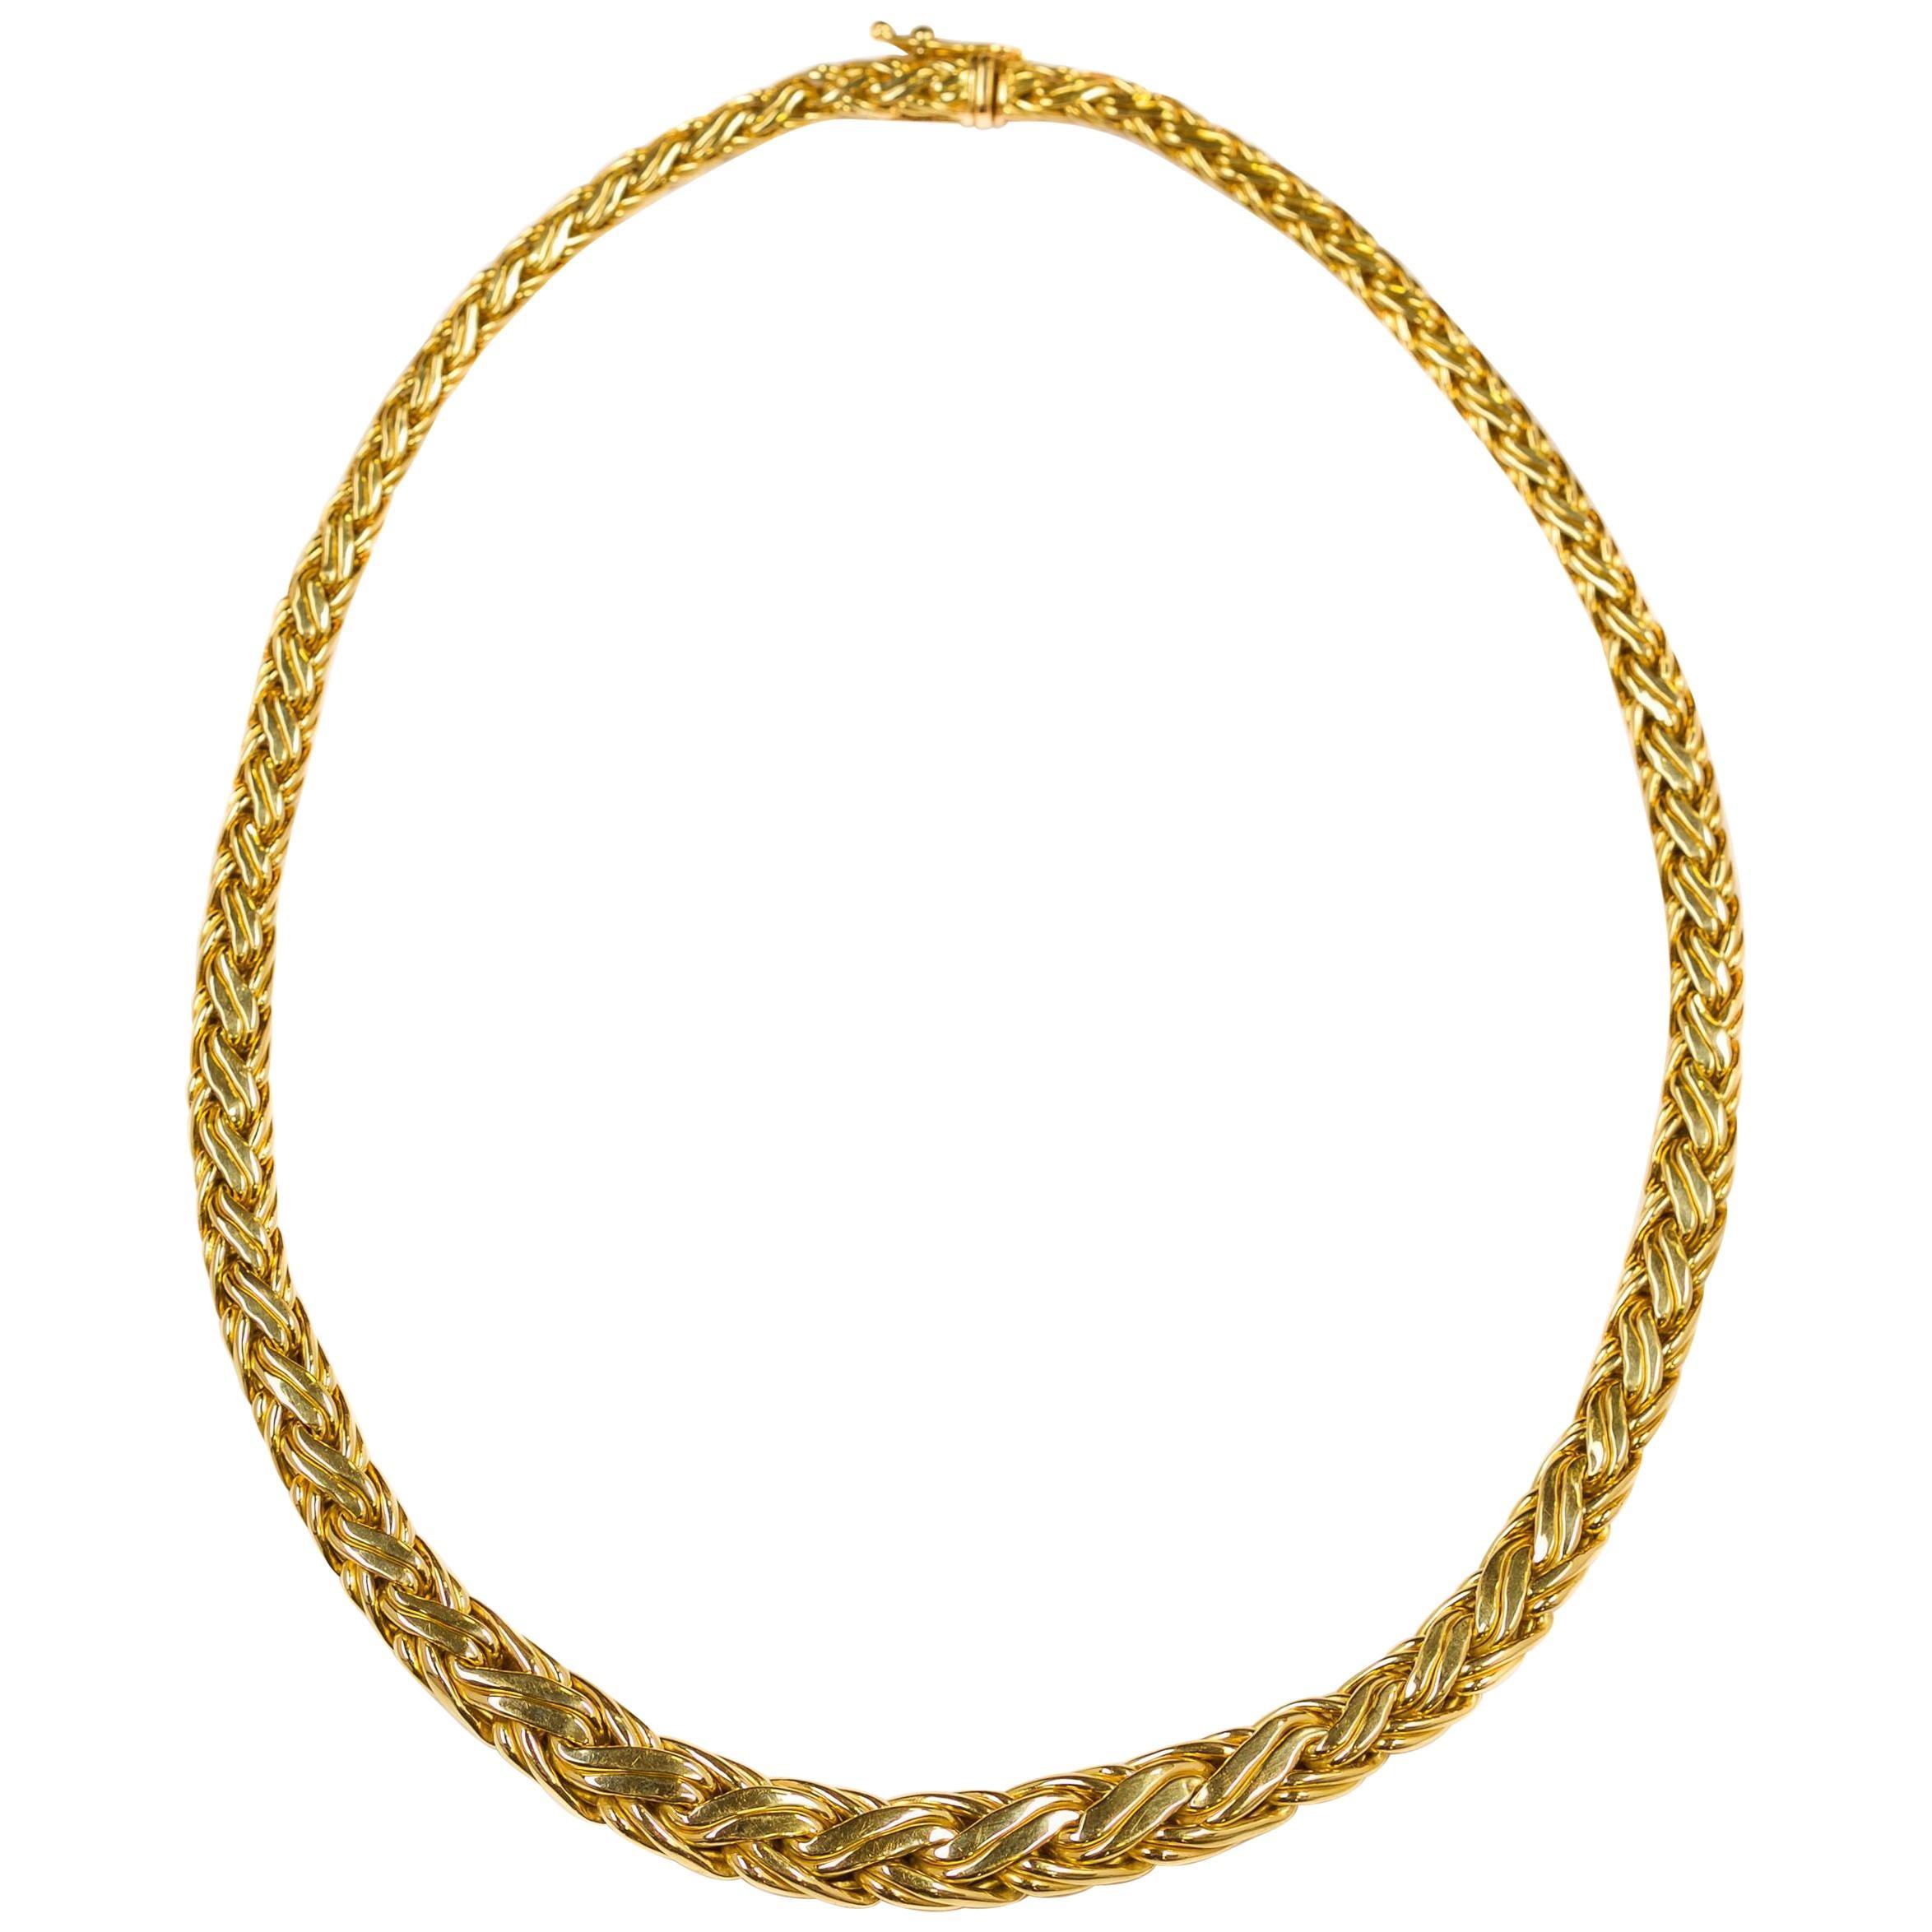 Tiffany & Co. 18k Yellow Gold Byzantine Woven Necklace